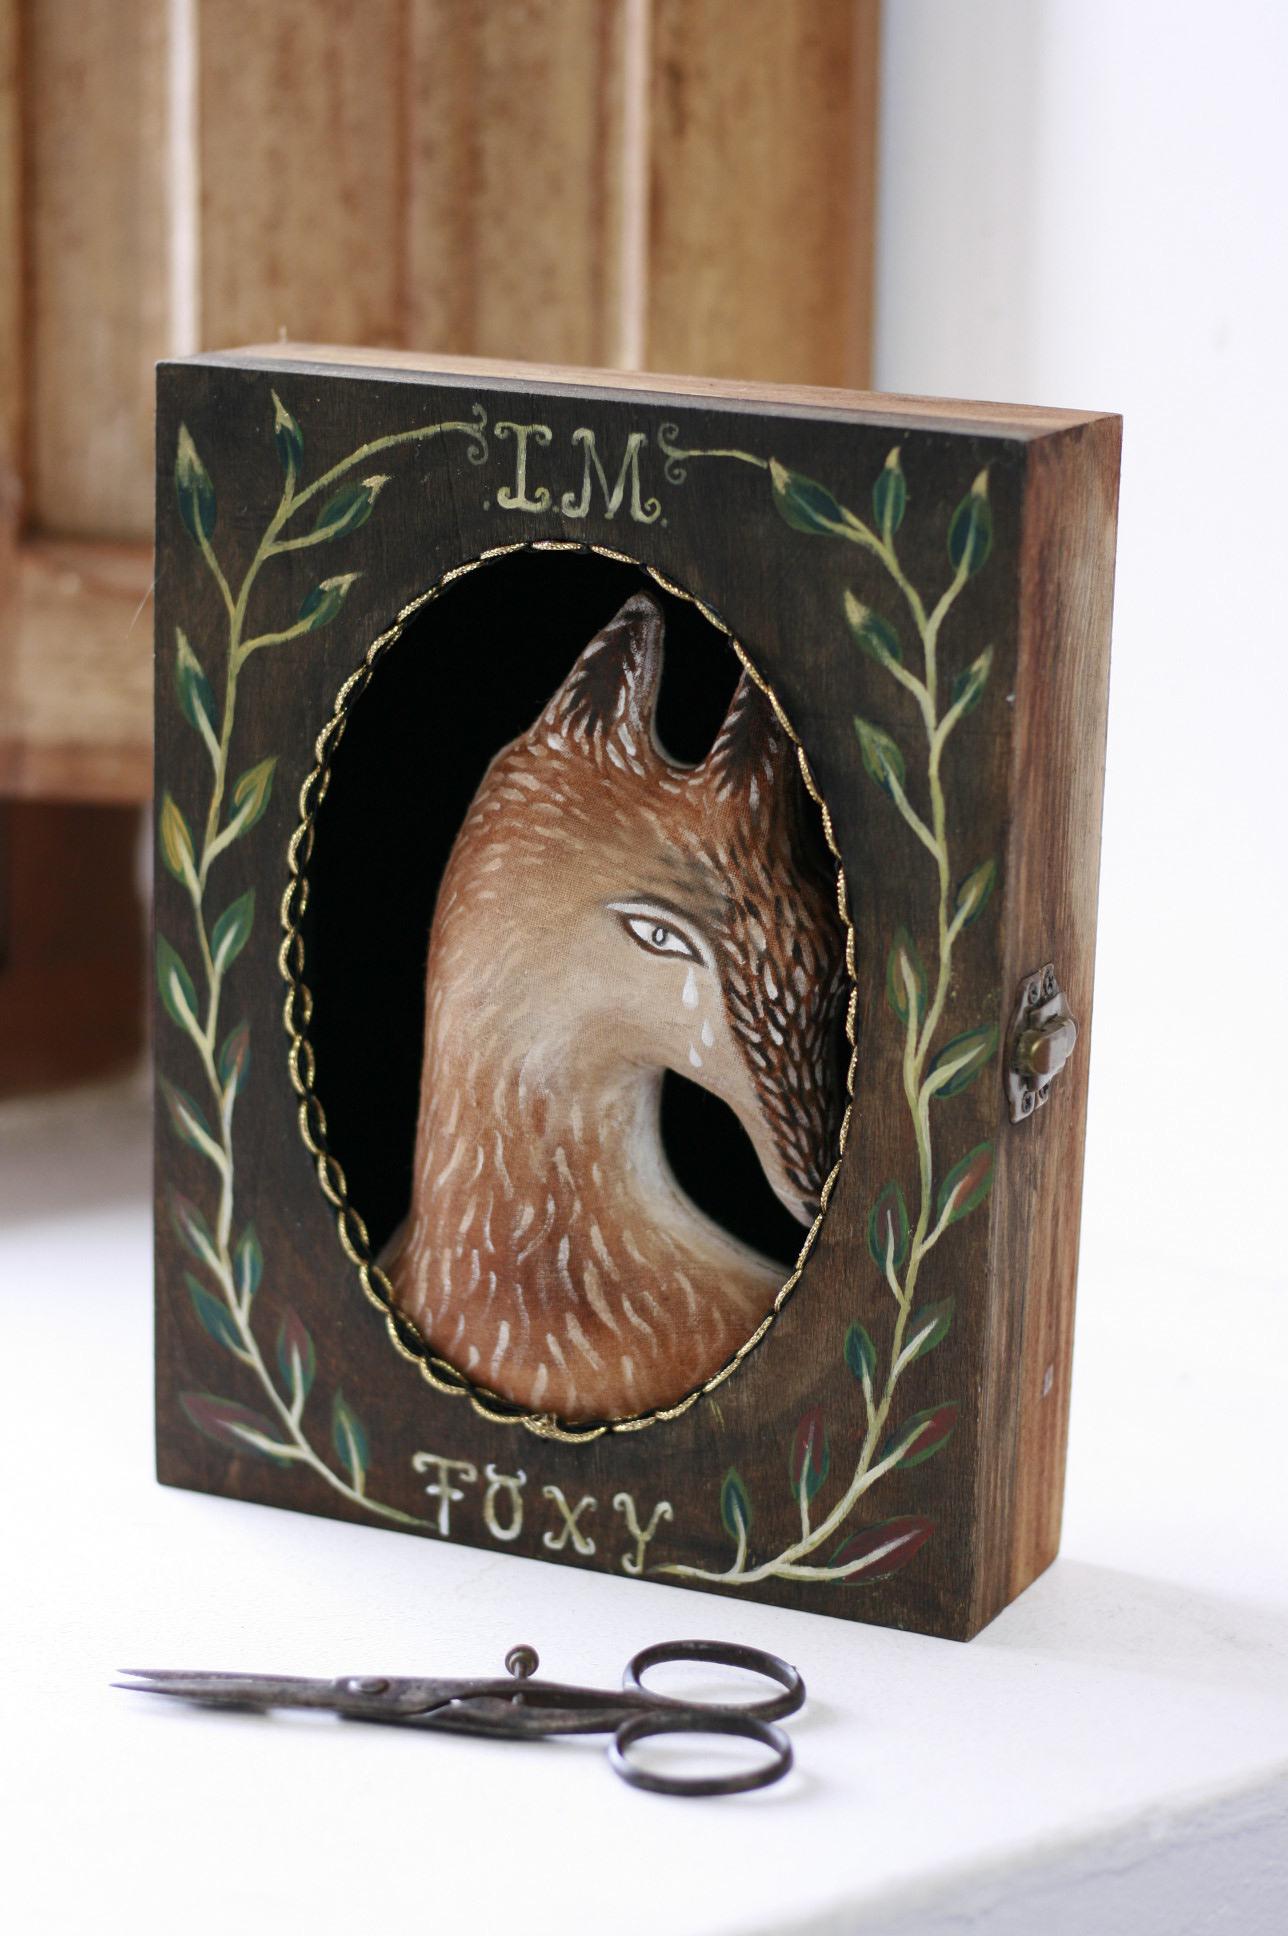 Foxy I.M.